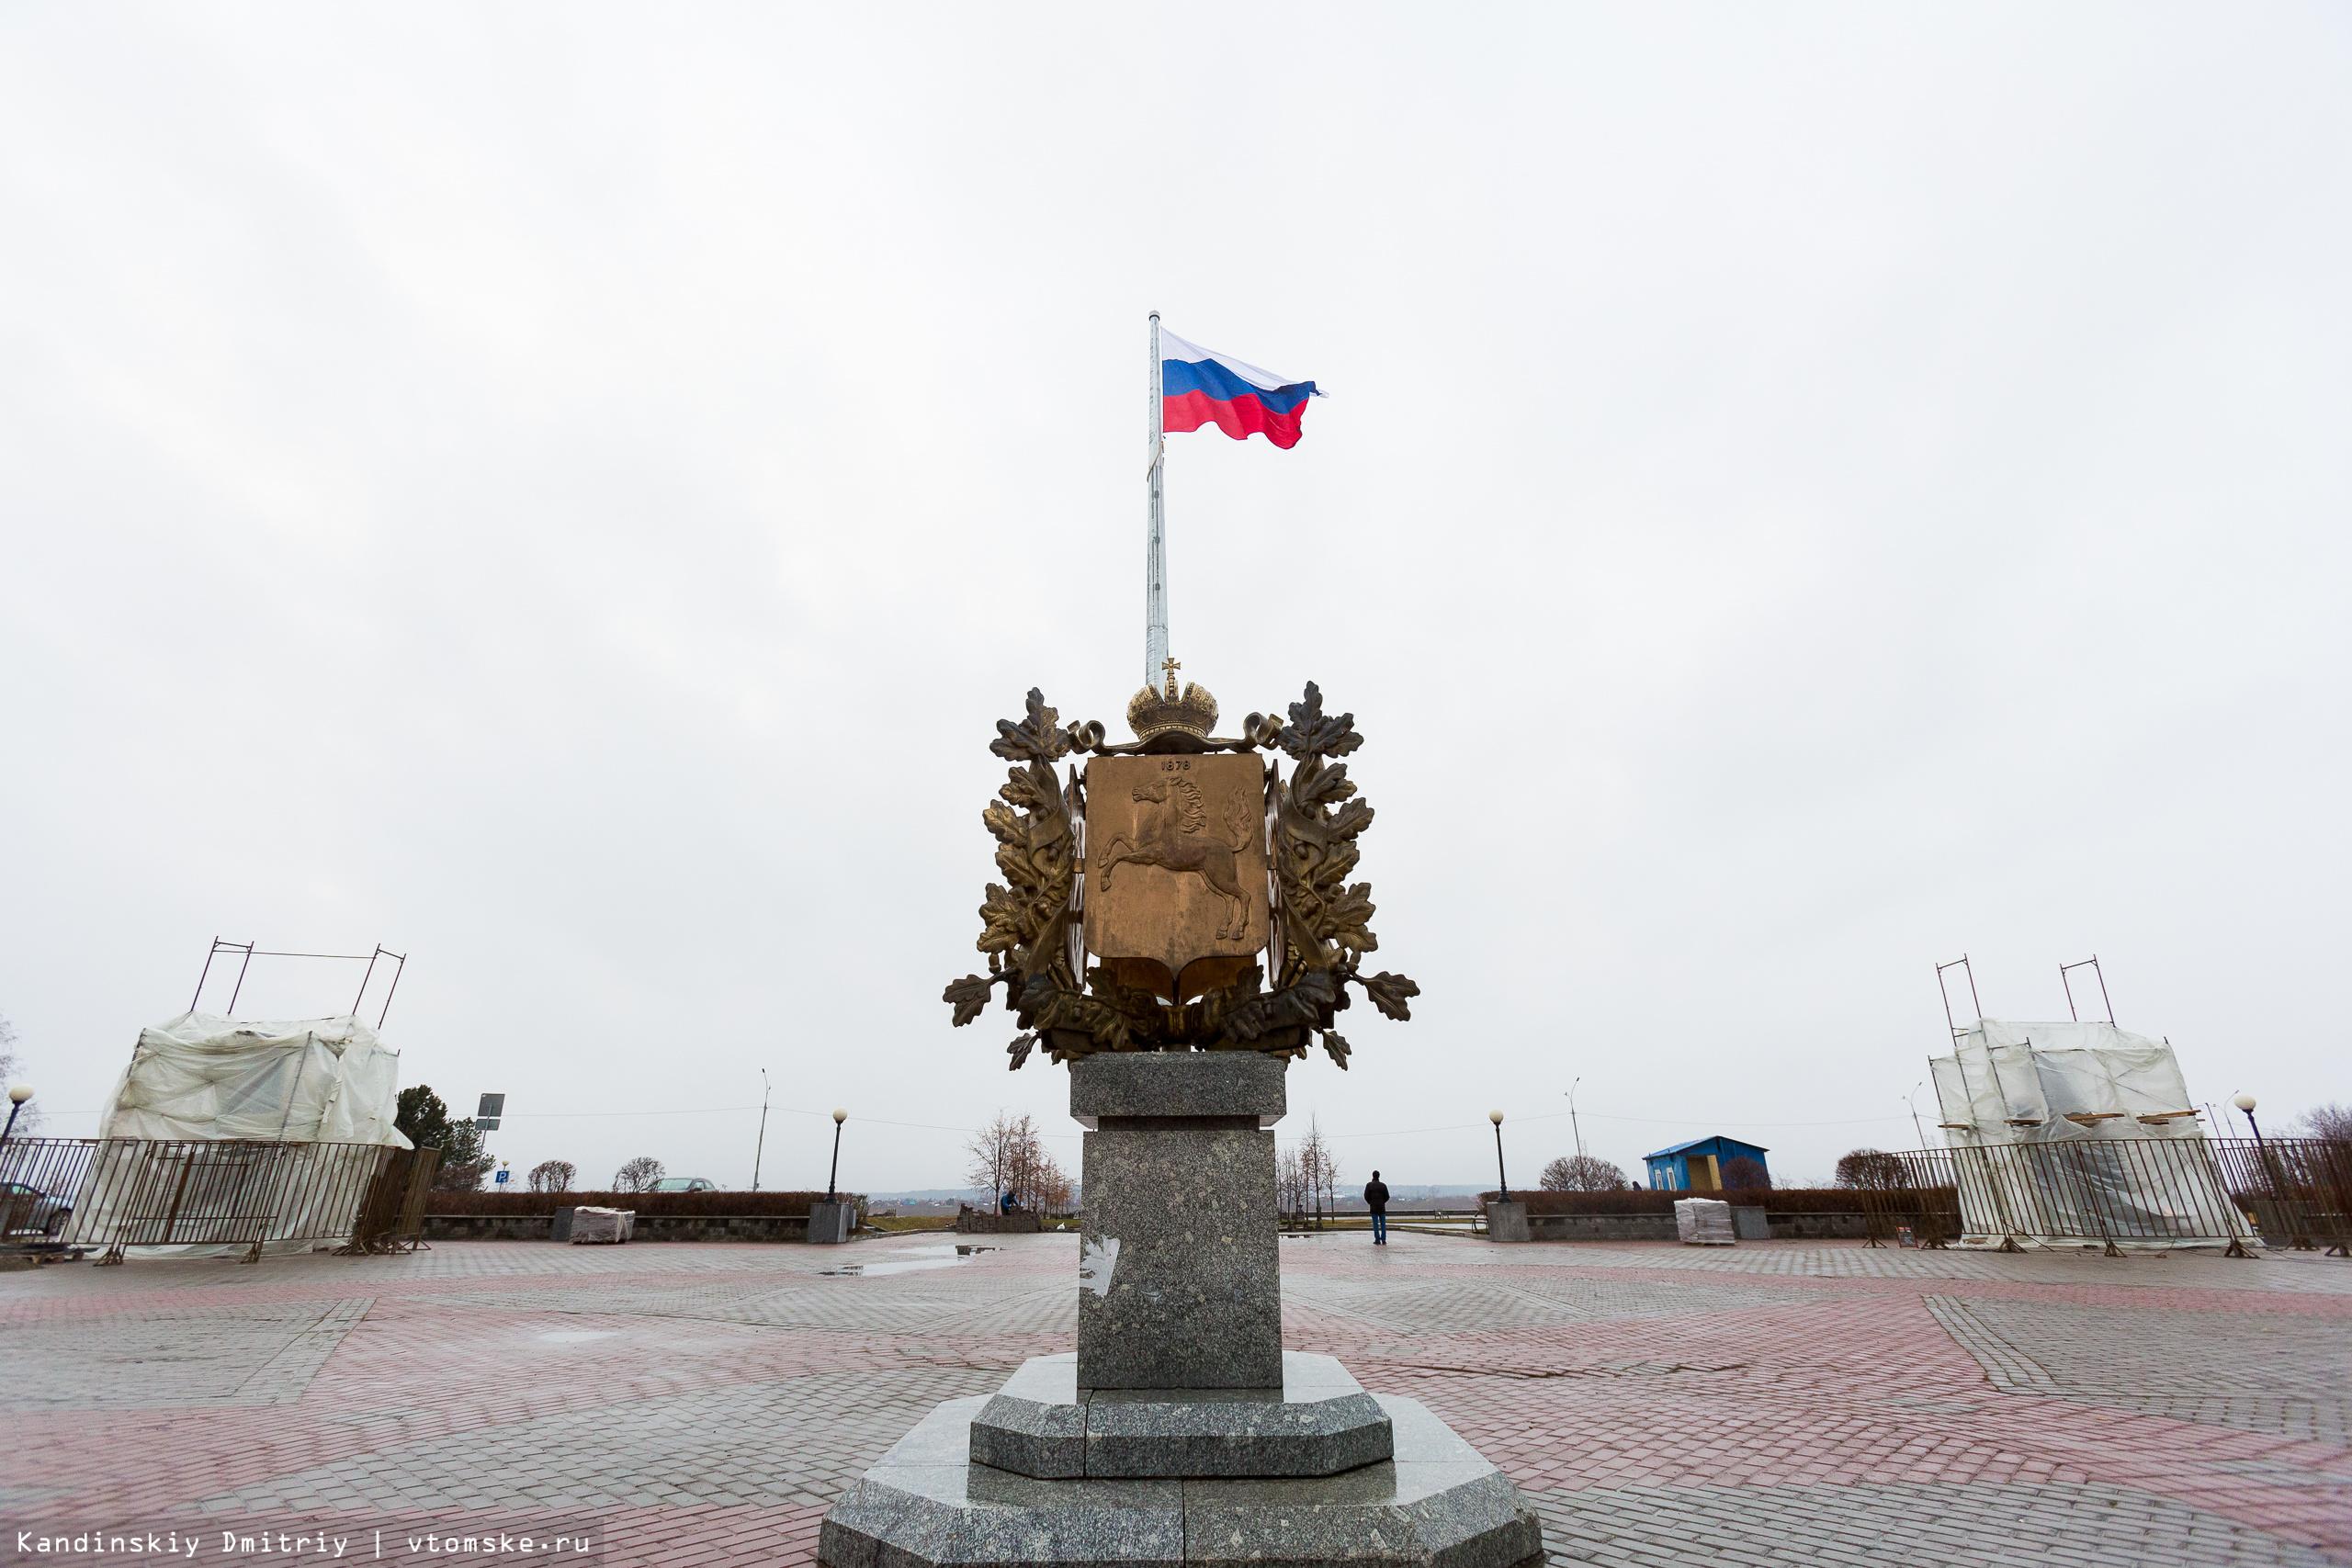 Флагшток высотой 50 м установили у драмтеатра в Томске